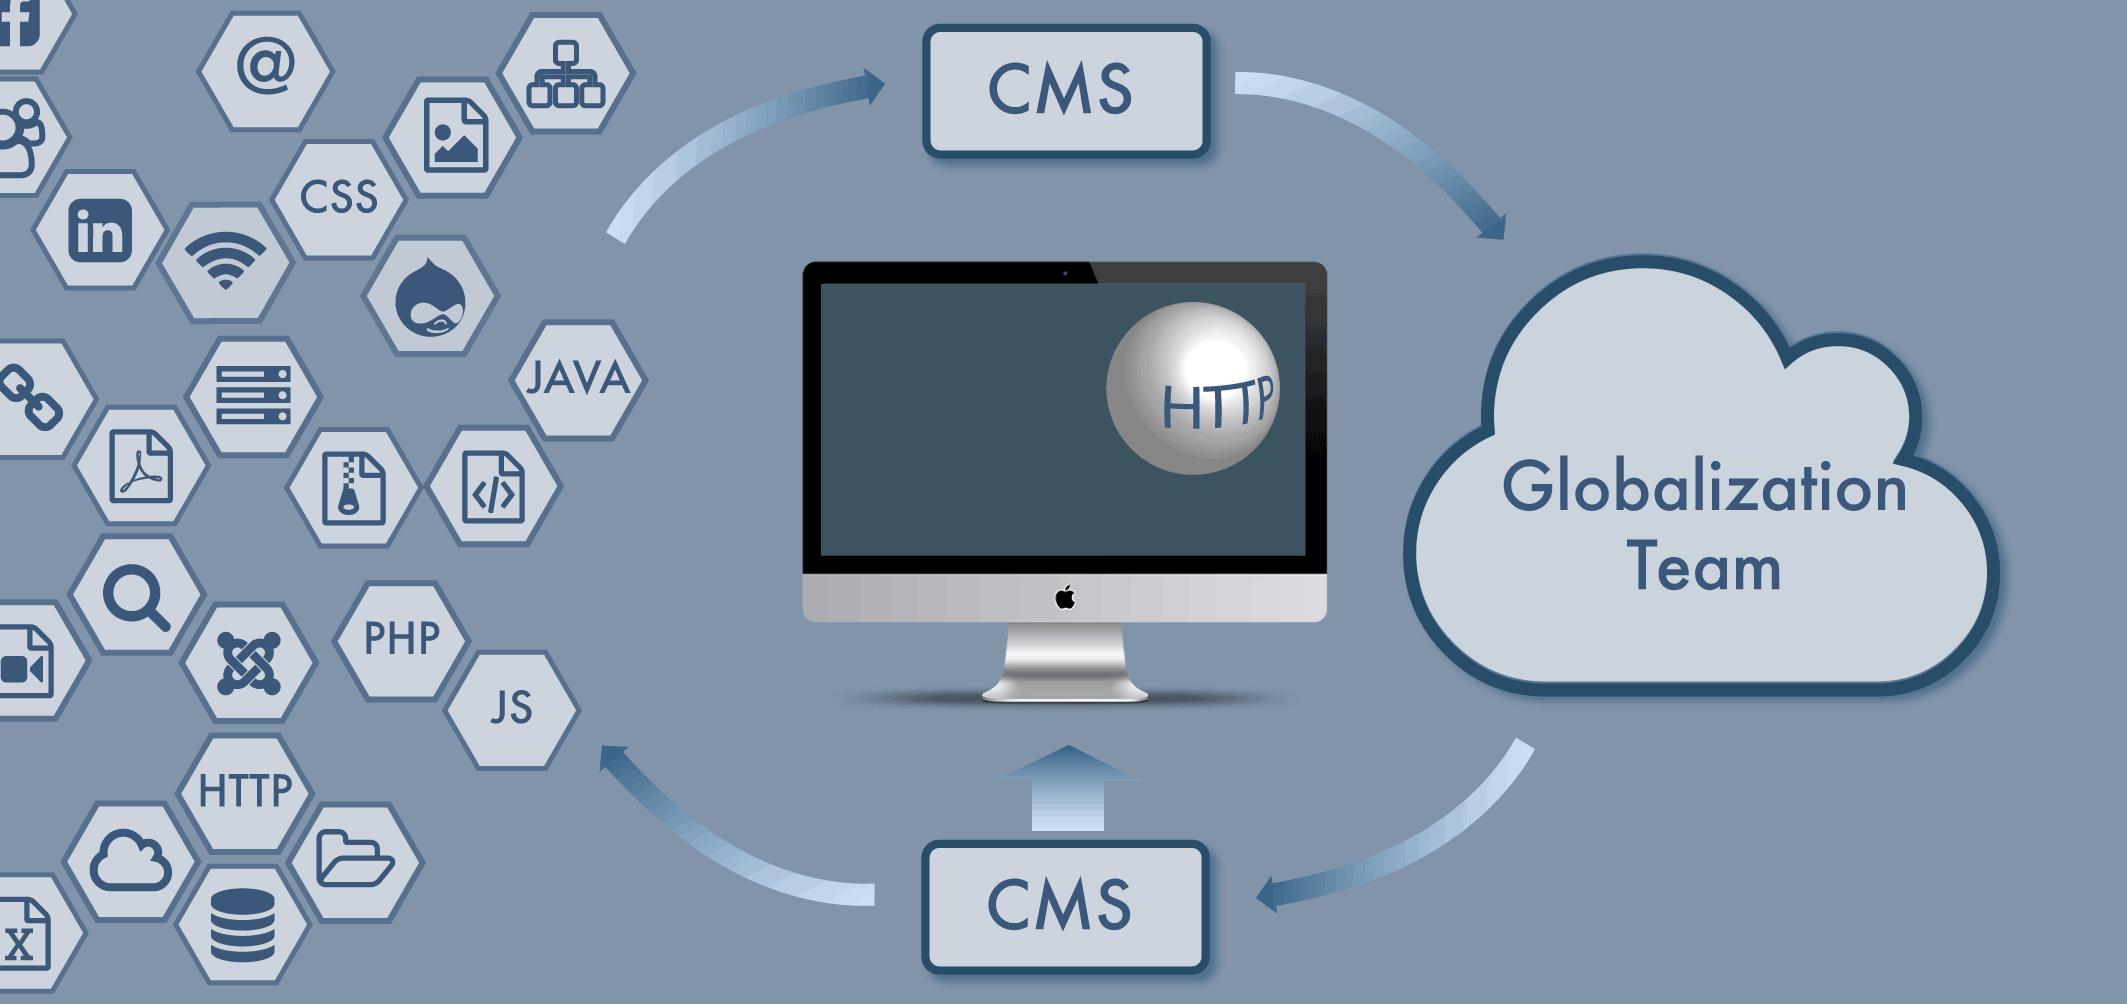 web globalization, website translation and globalization services